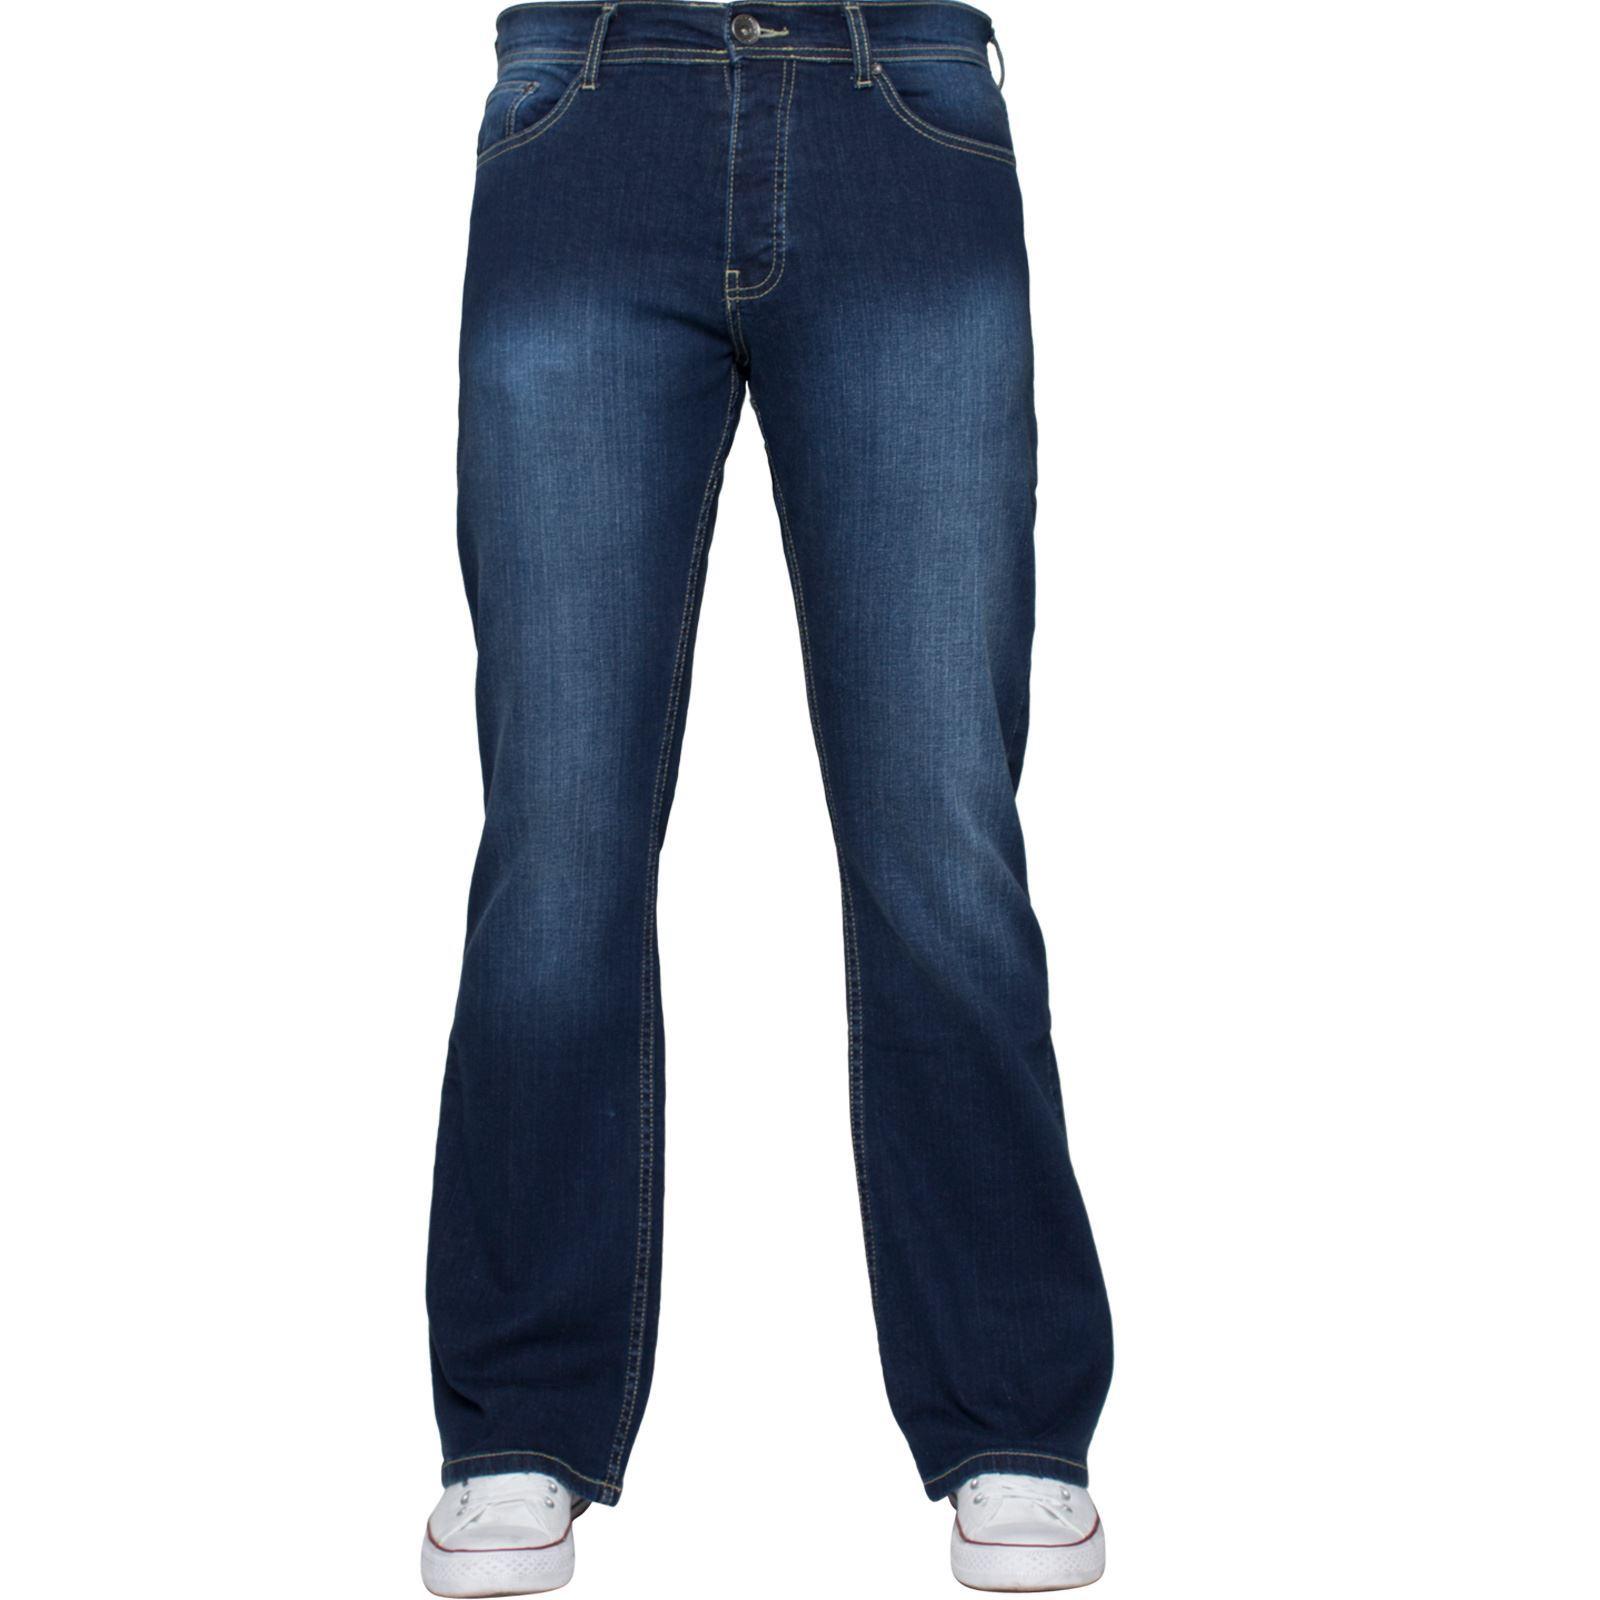 Para-Hombre-Pierna-Recta-Bootcut-Stretch-Denim-Regulares-Pantalon-de-trabajo-Kruze-Todas-Cinturas miniatura 52